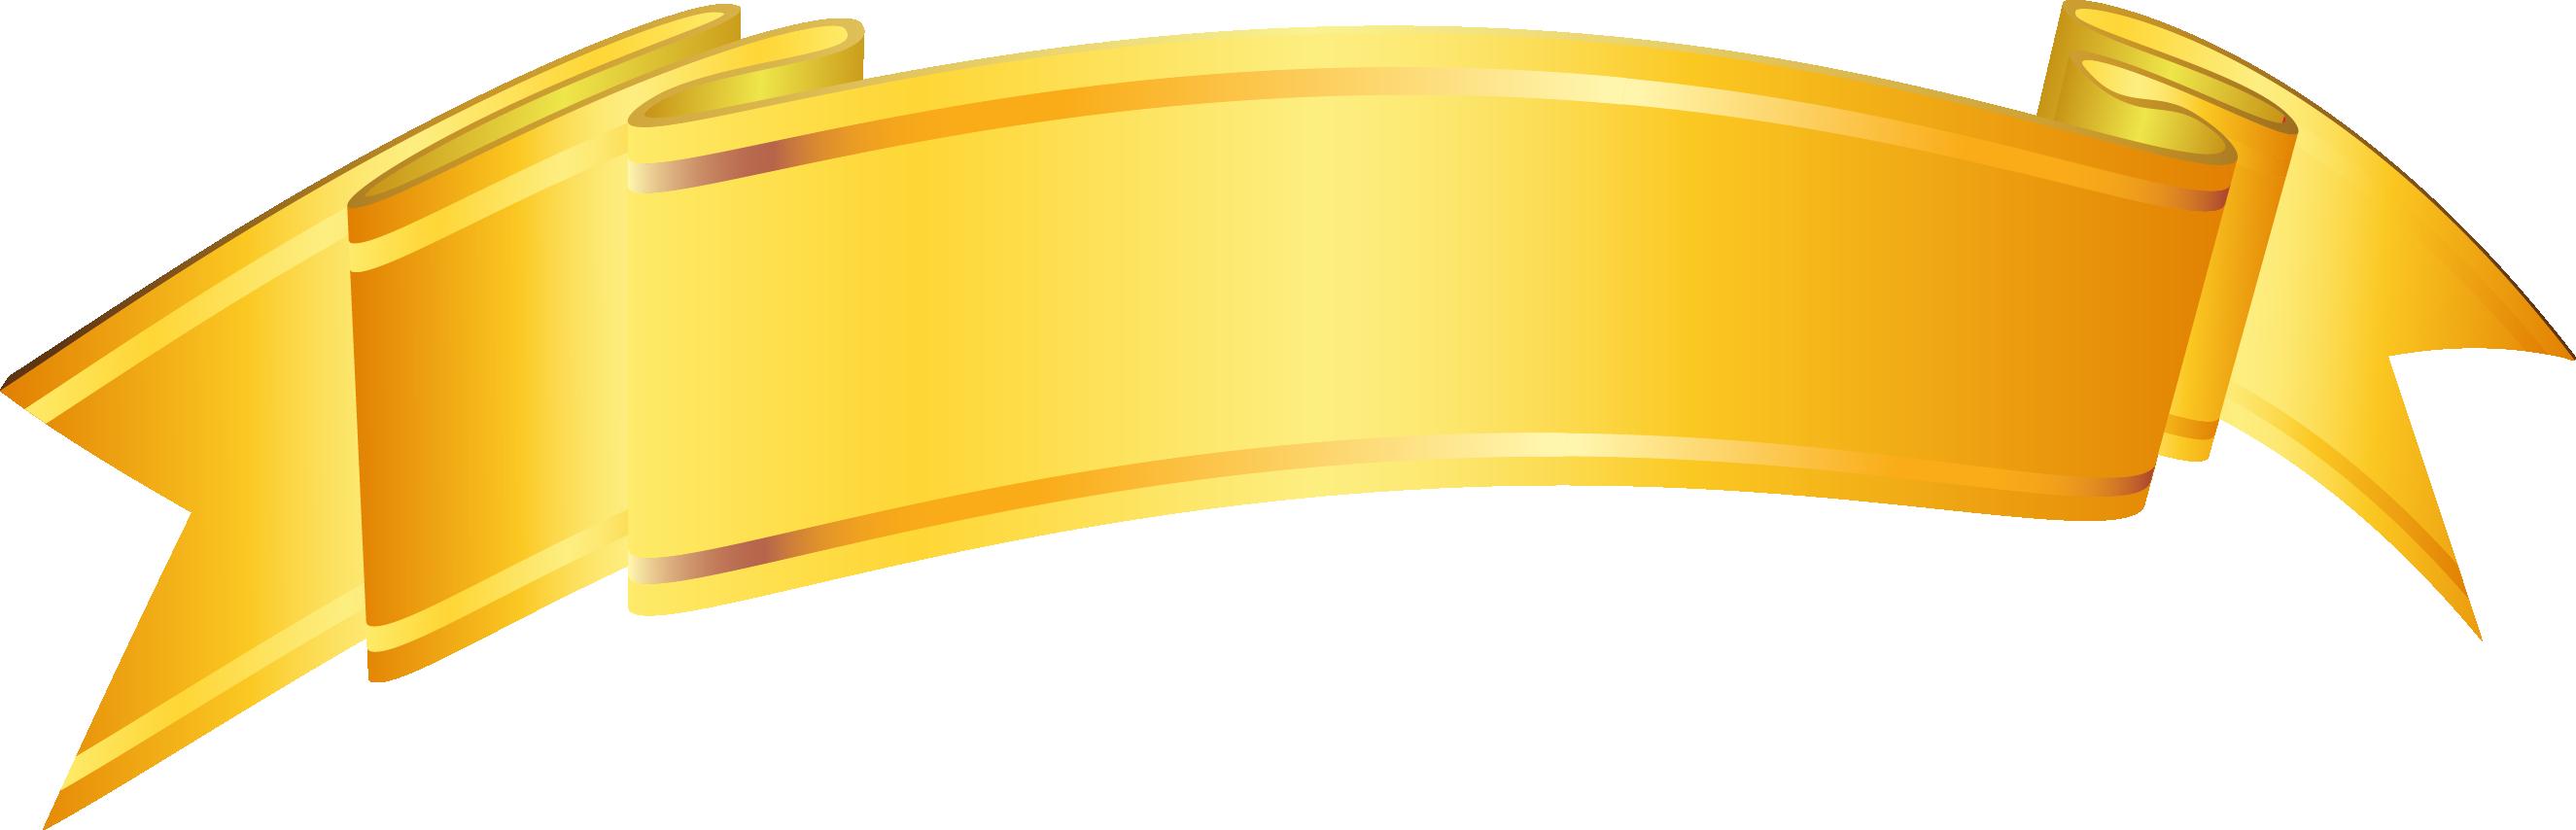 2650x854 Gold Banner